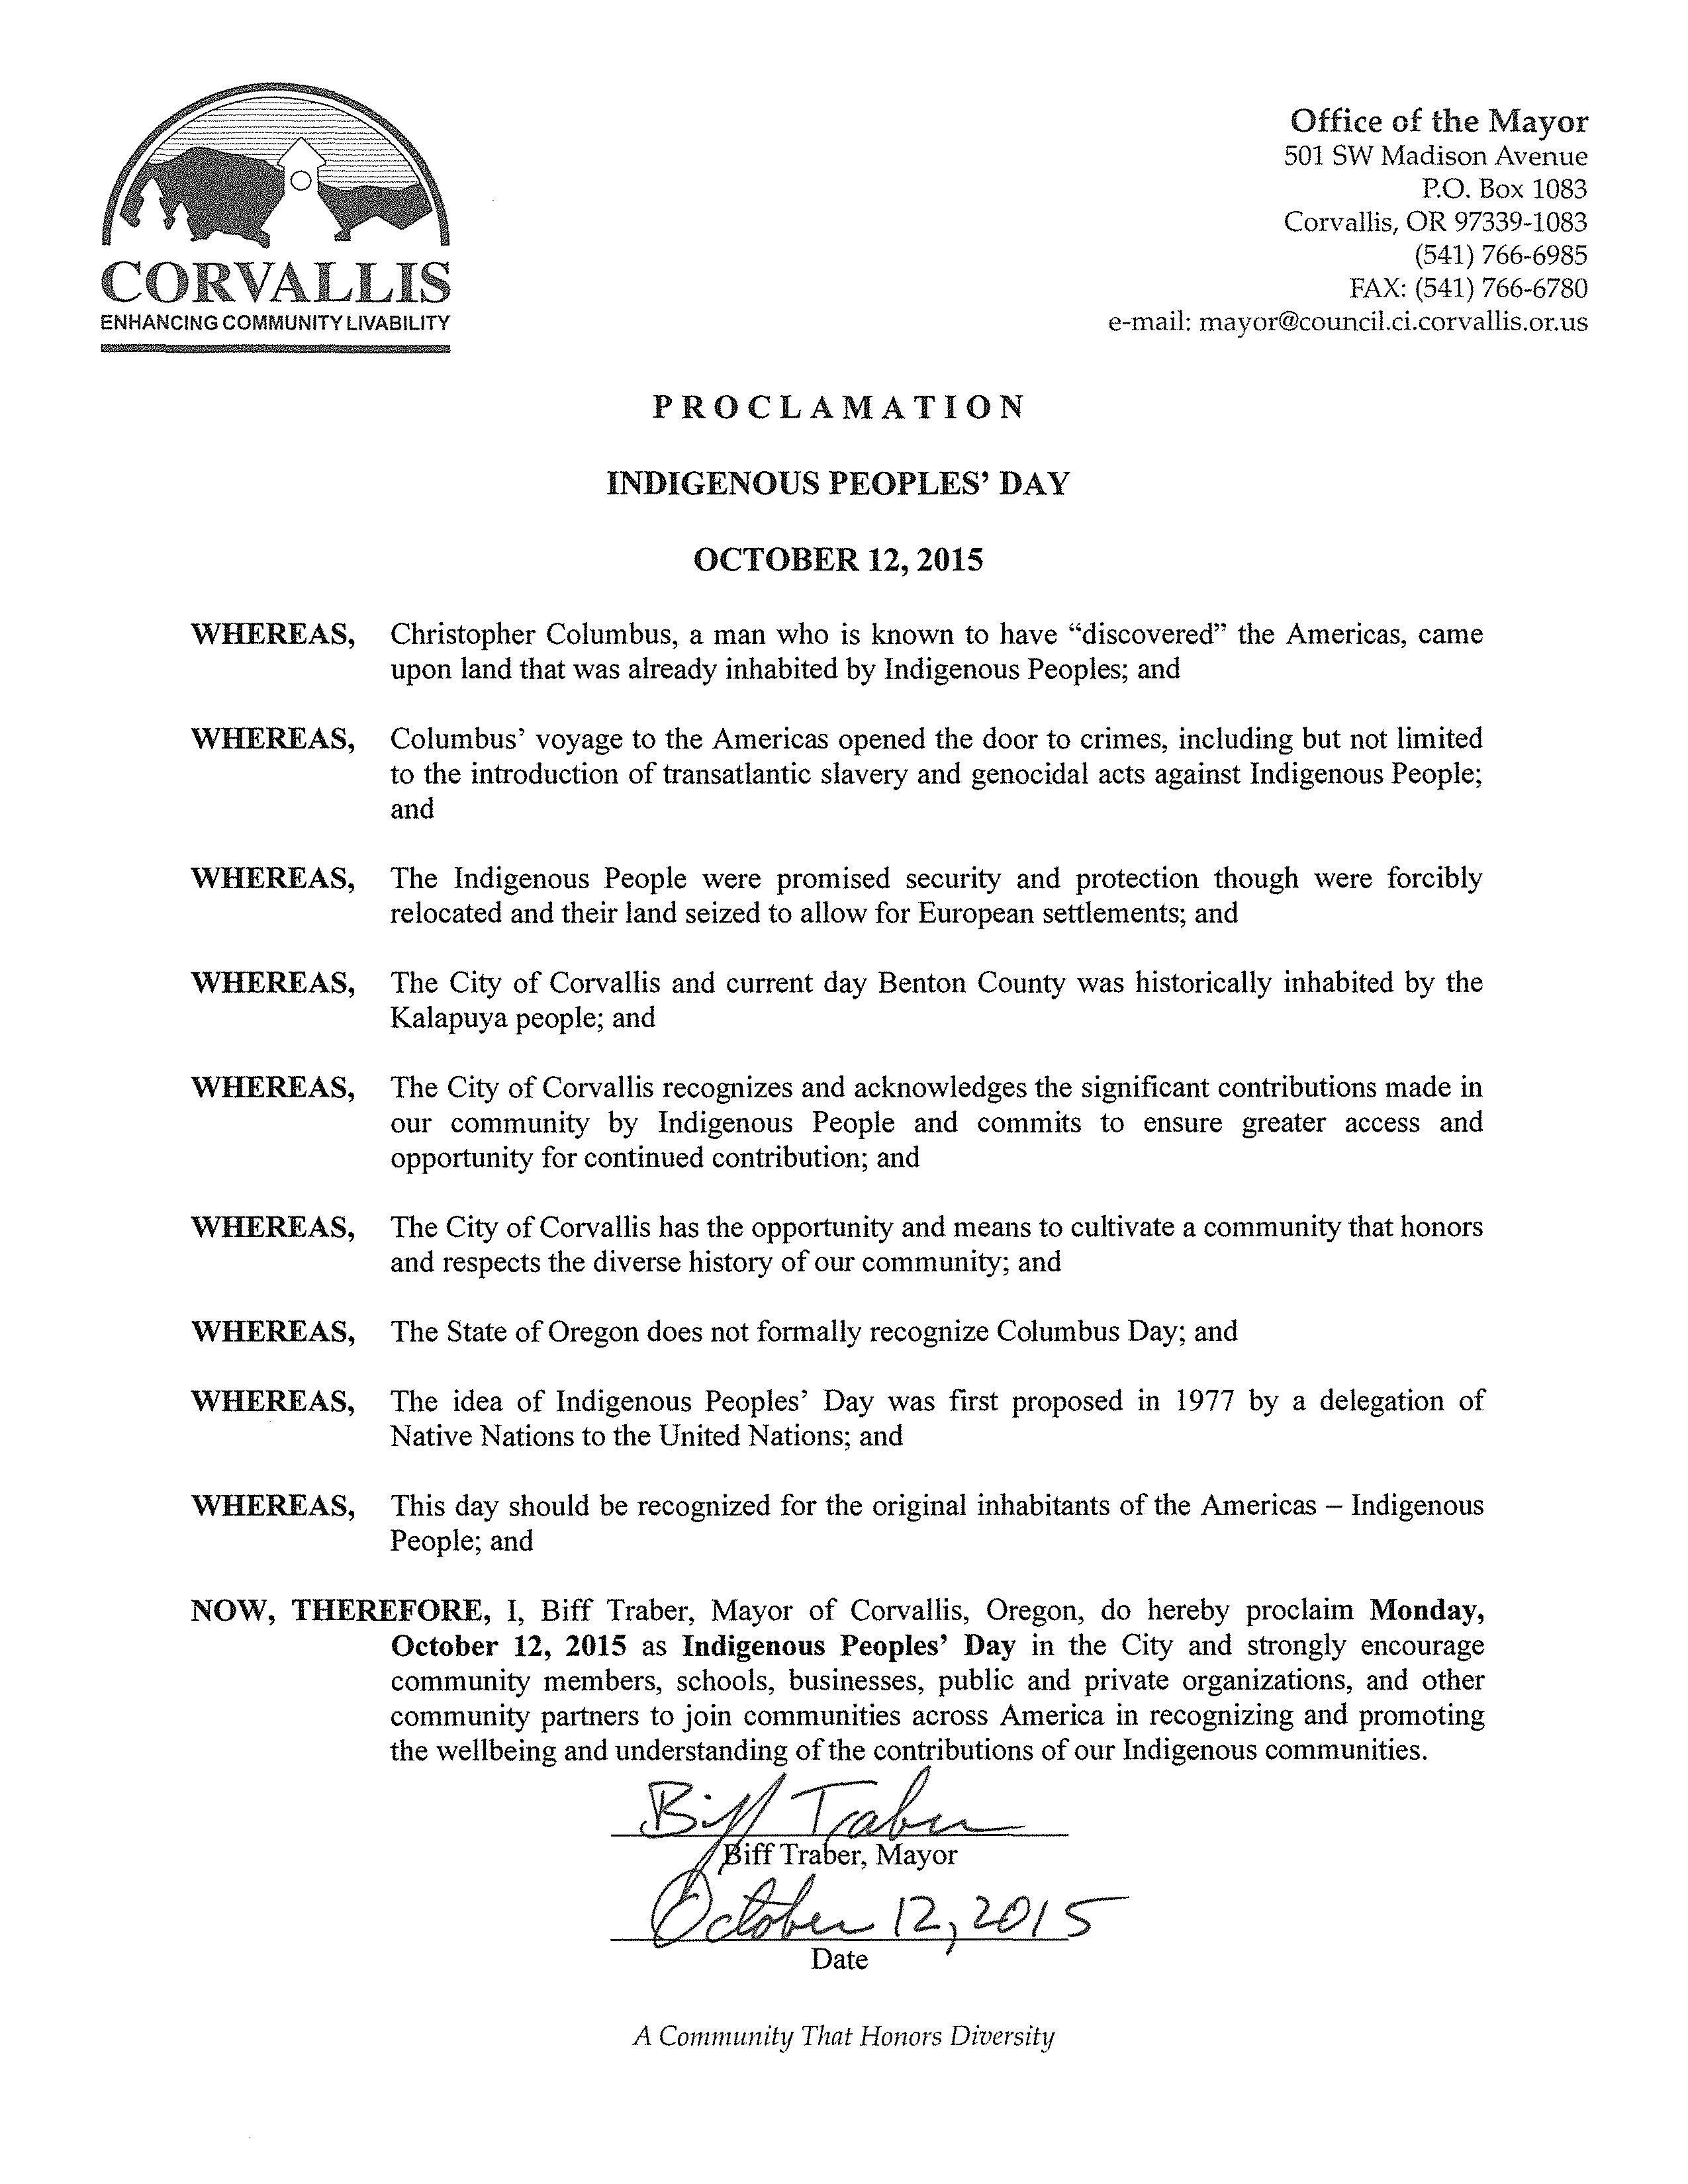 Abolish Columbus Day Campaign - Zinn Education Project